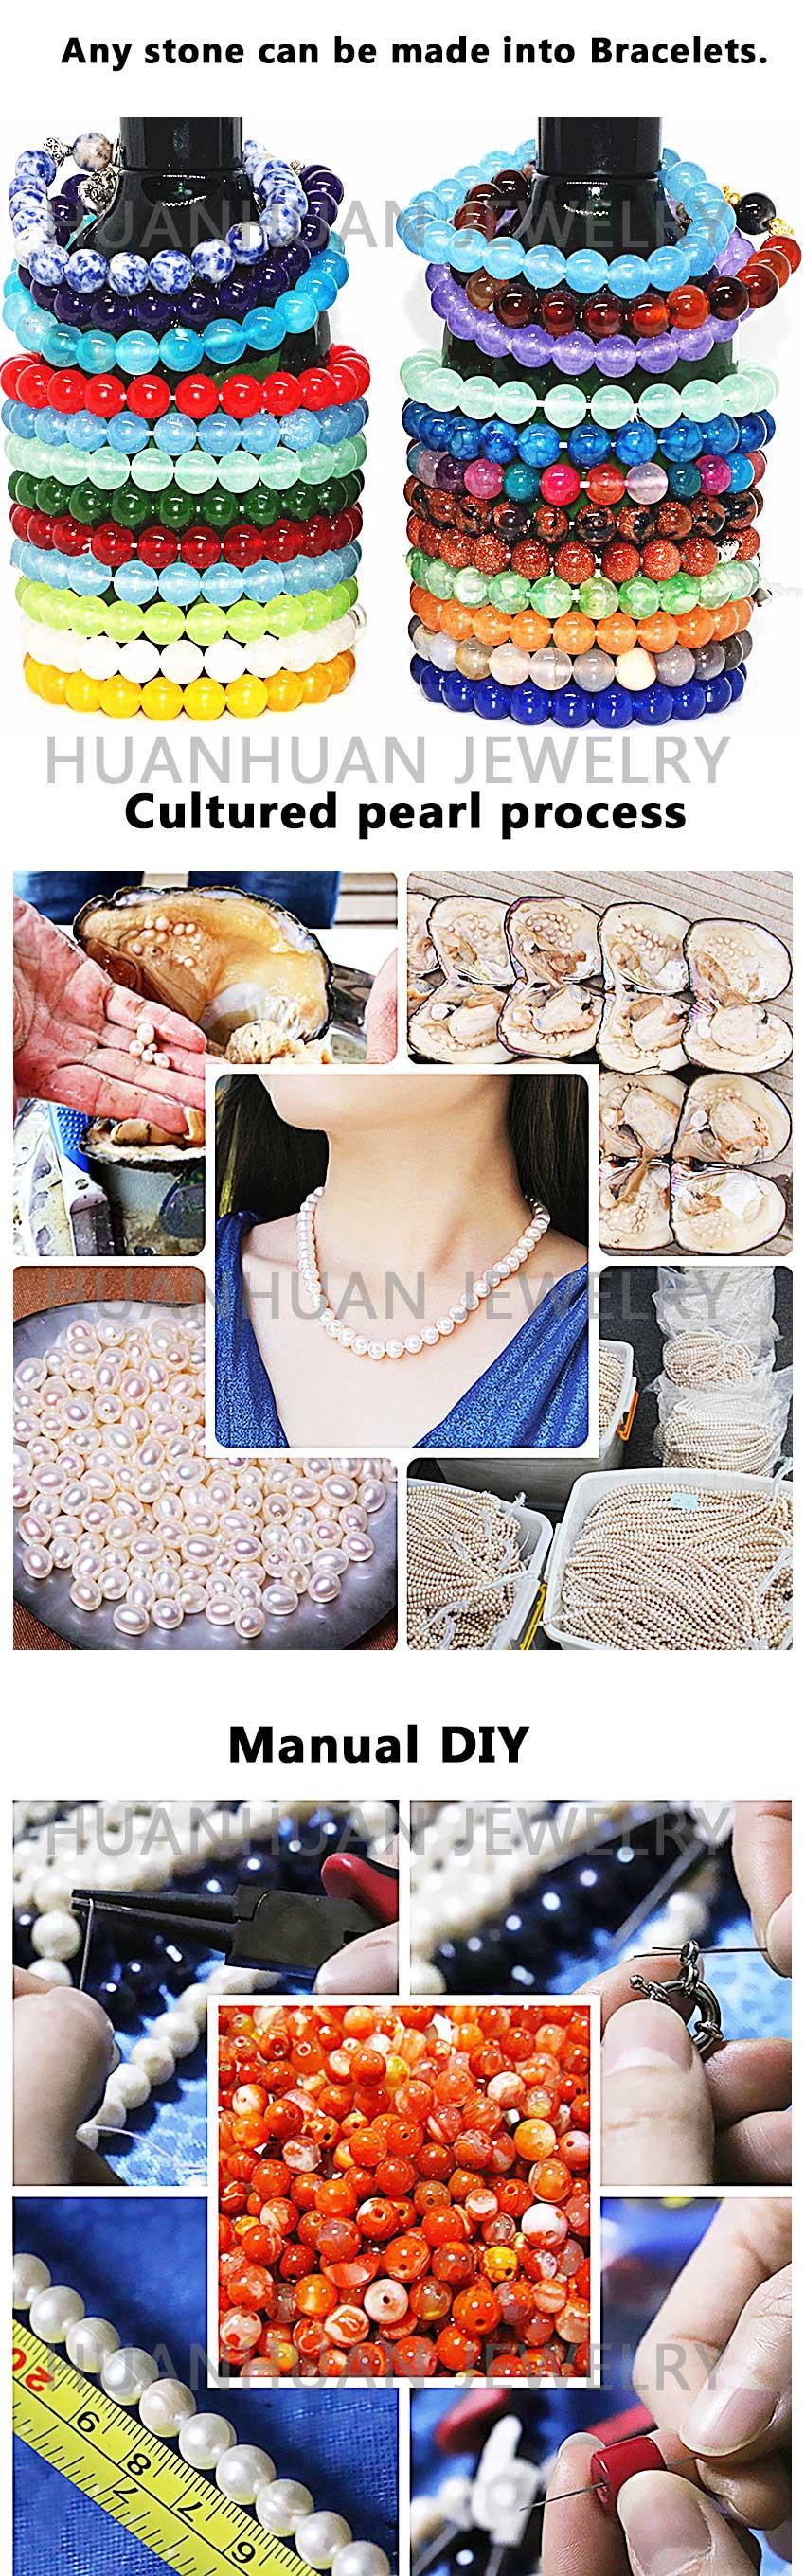 Huanhuan-jewelry_05